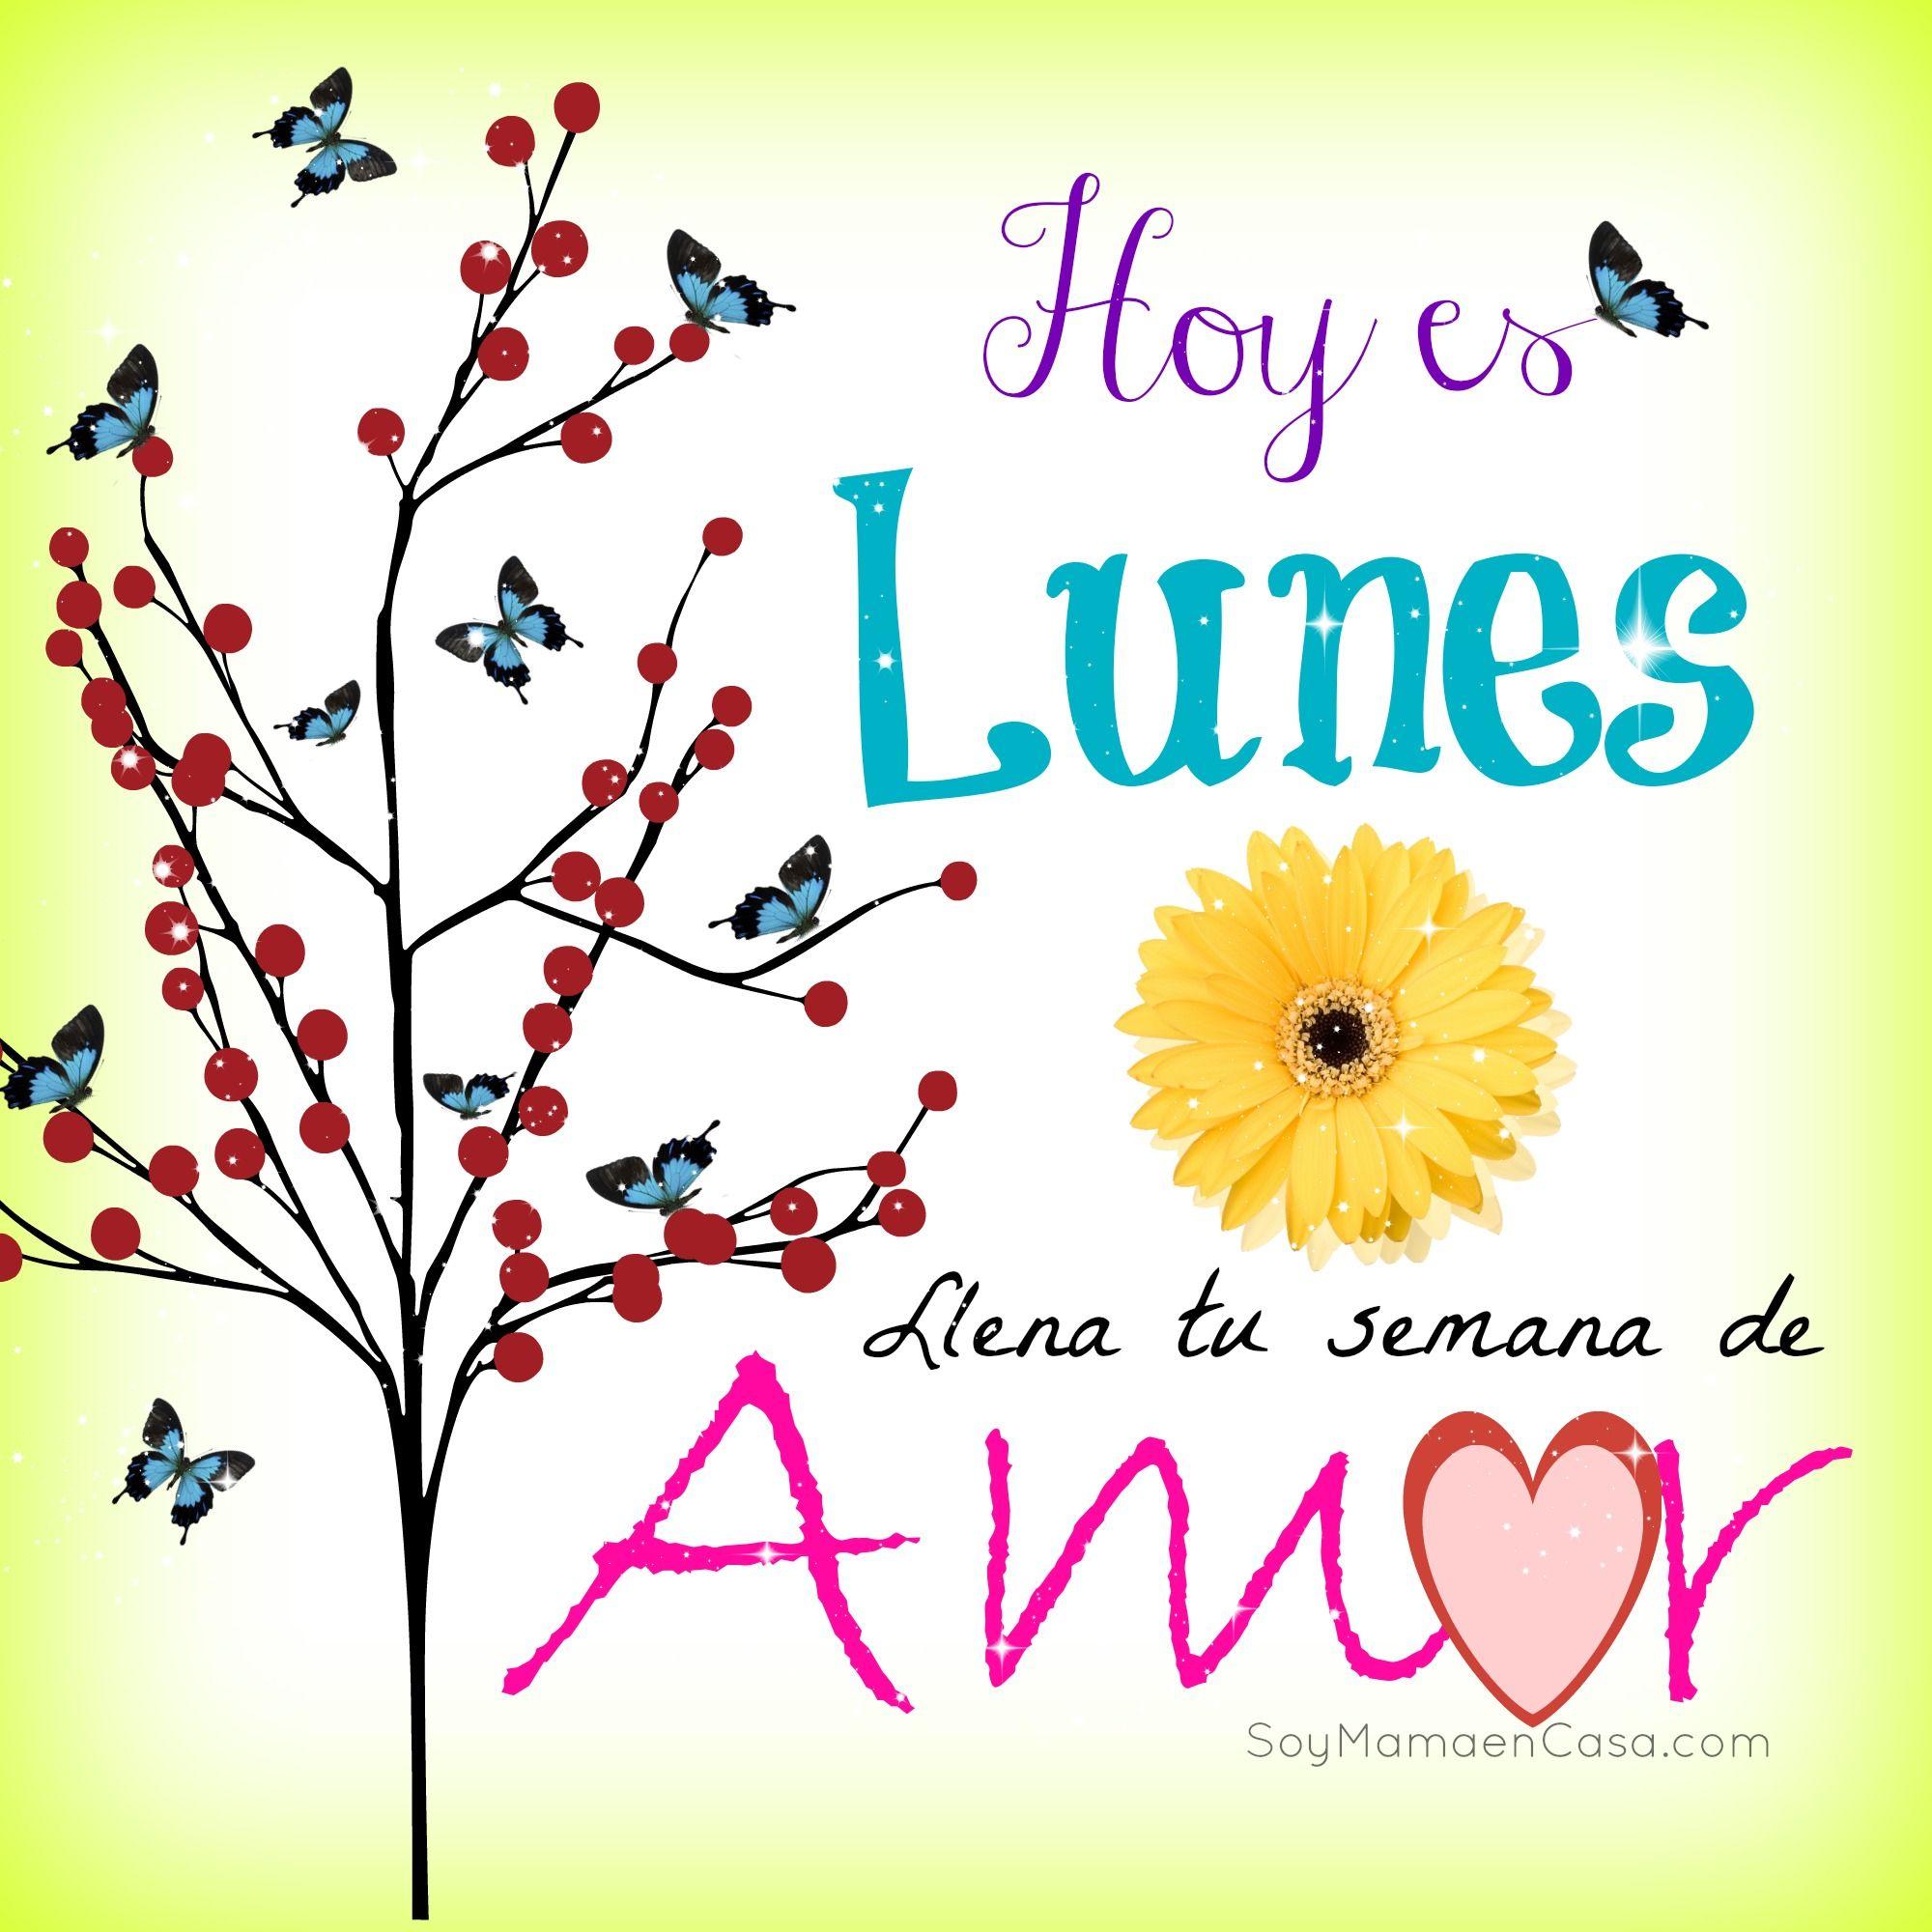 Feliz Lunes Saludos Www Soymamaencasa Com Buenos Dias Saludos